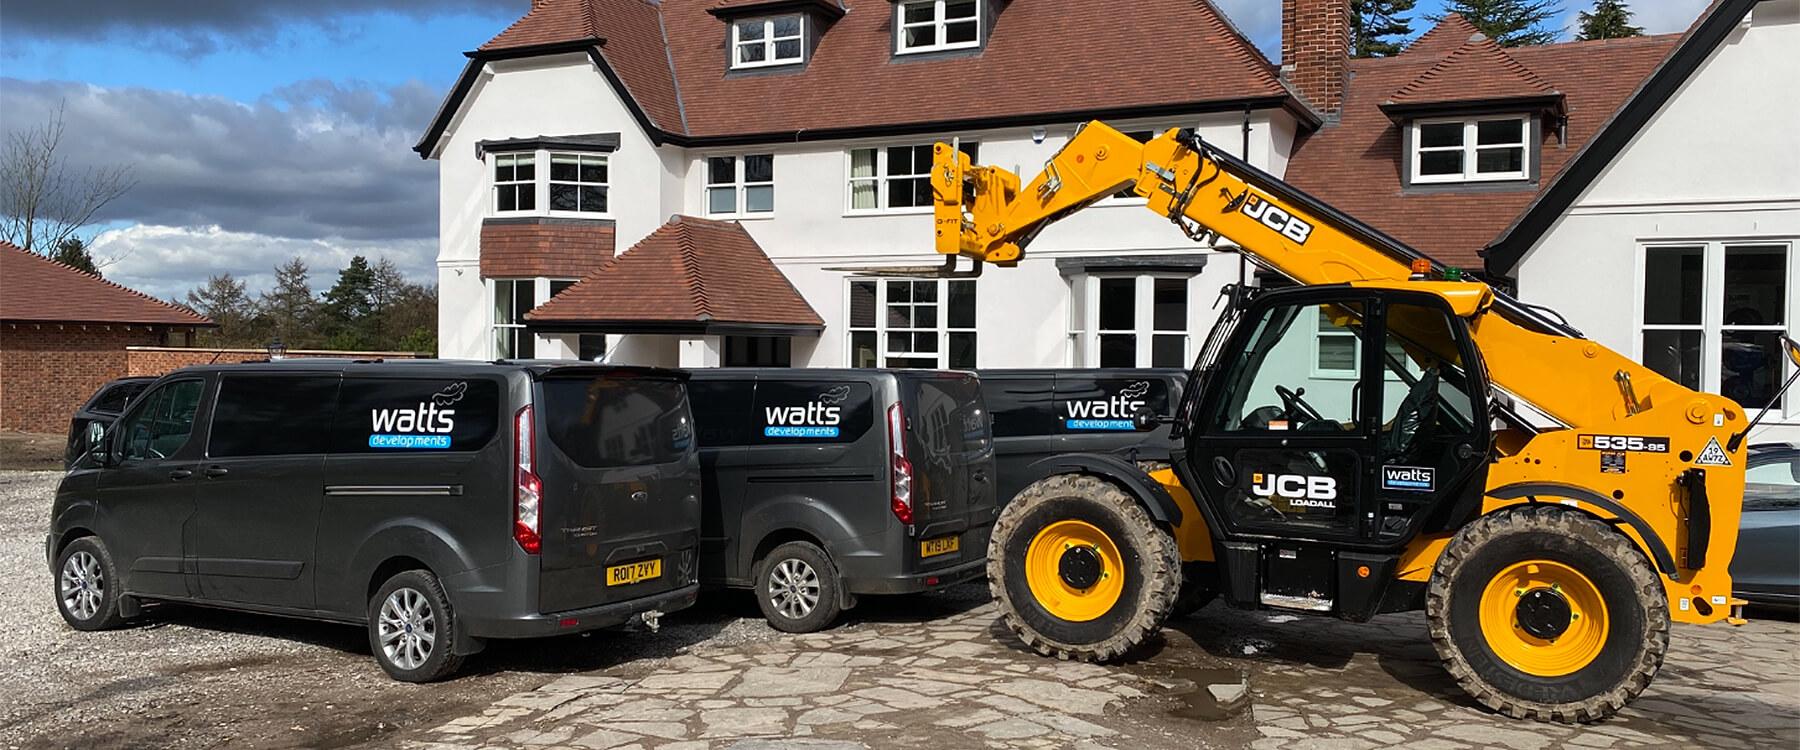 Watts Developments Transit Vans and JCB 535 fork lift